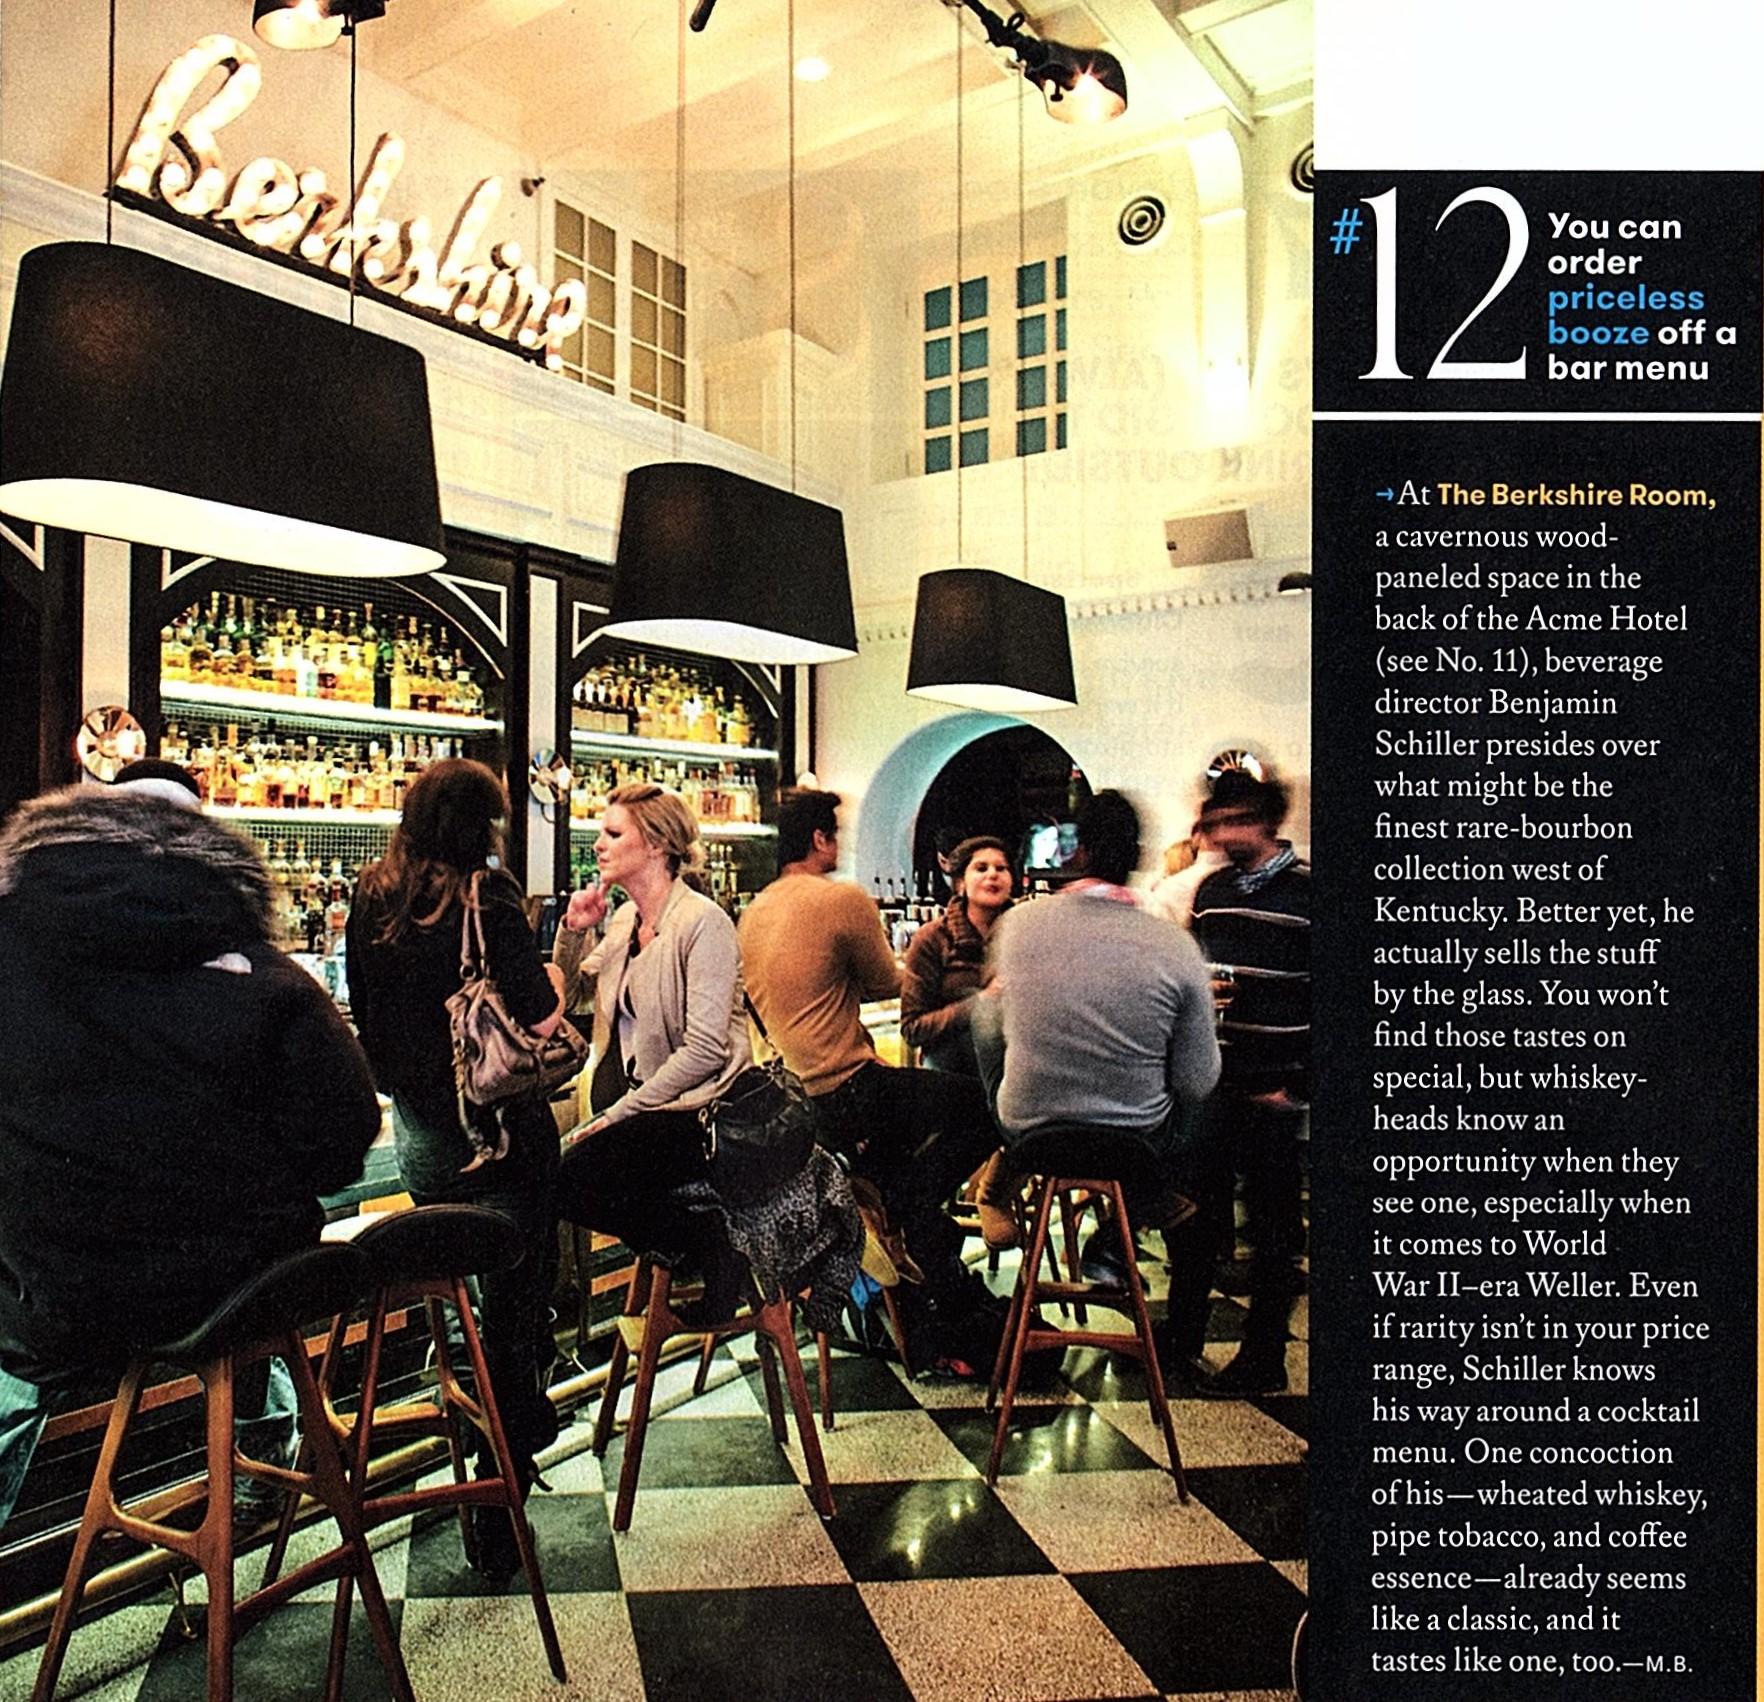 GQ Magazine - The Berkshire Room.jpg